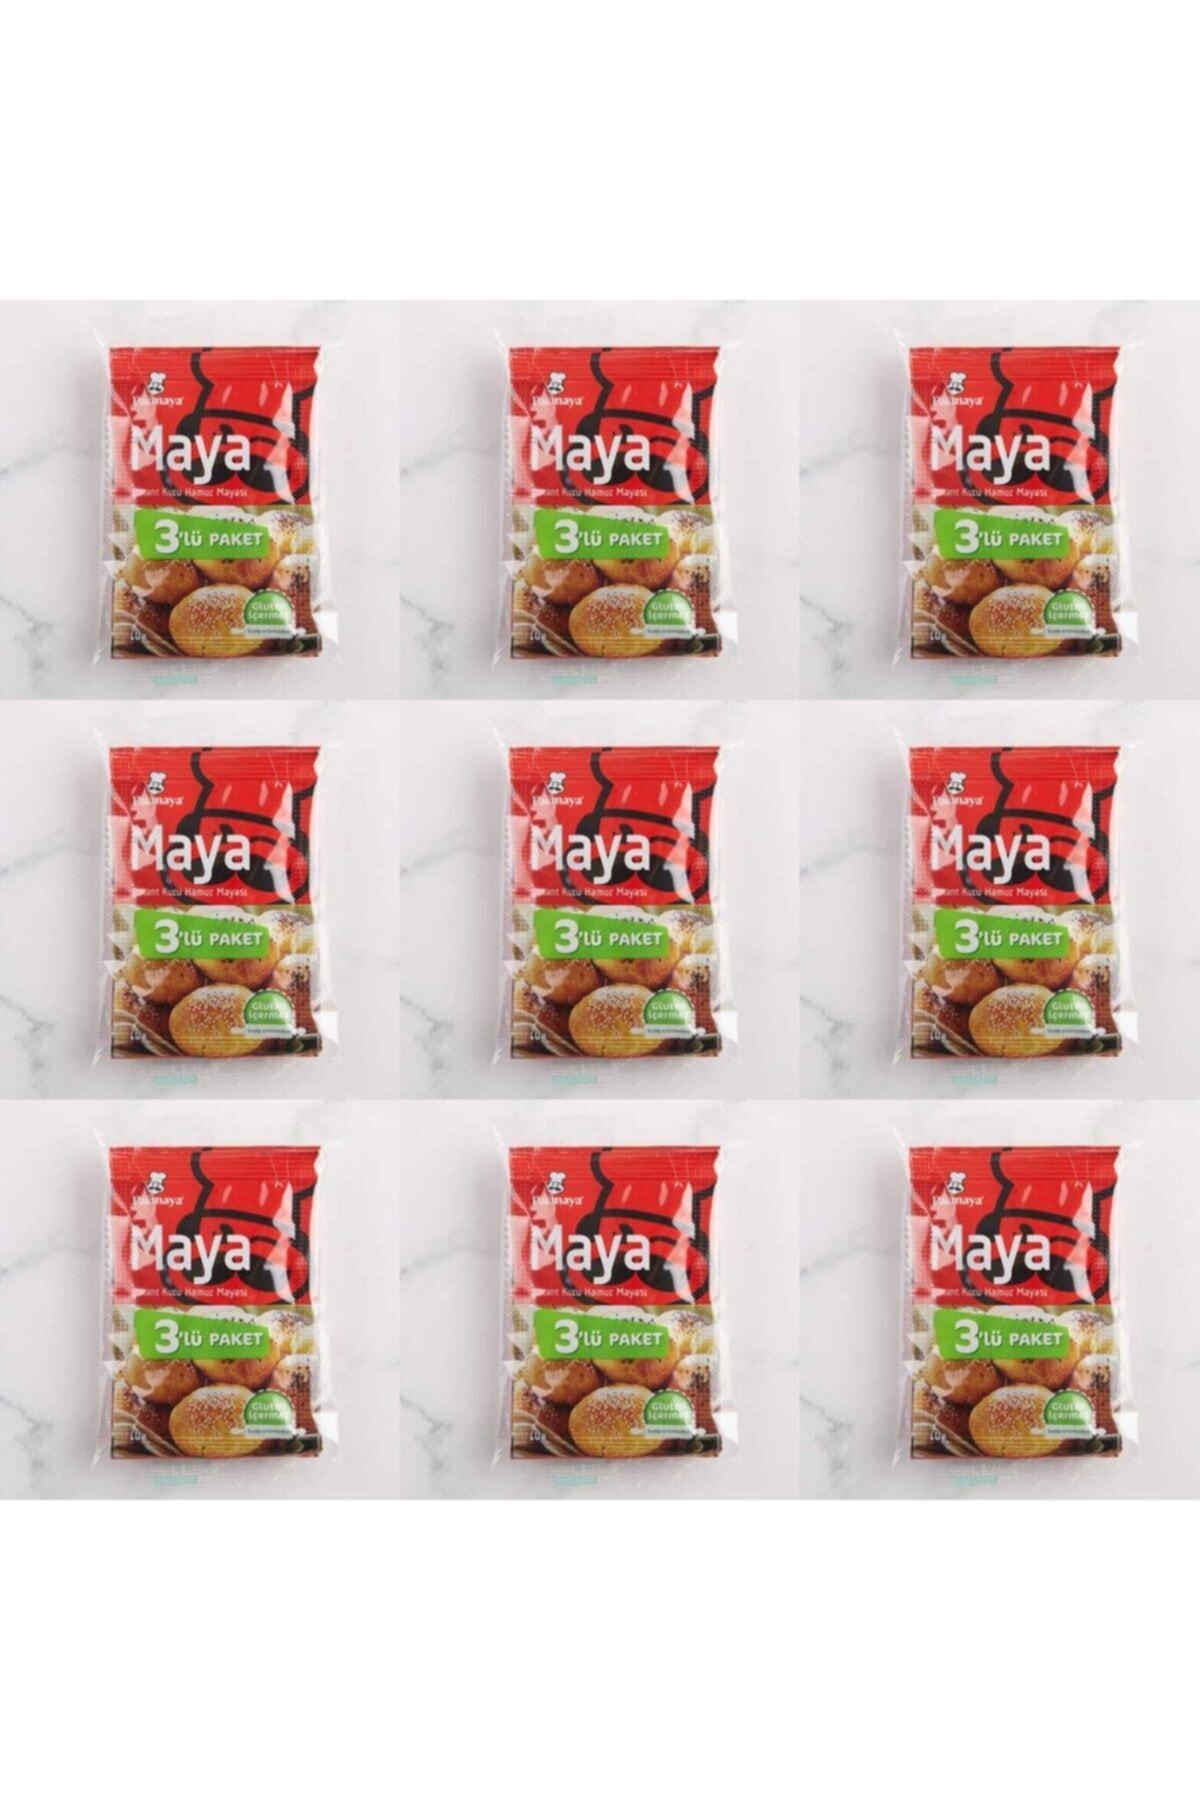 Pakmaya Glutensiz Instant Kuru Maya 3x10 gr 9 Paket 1